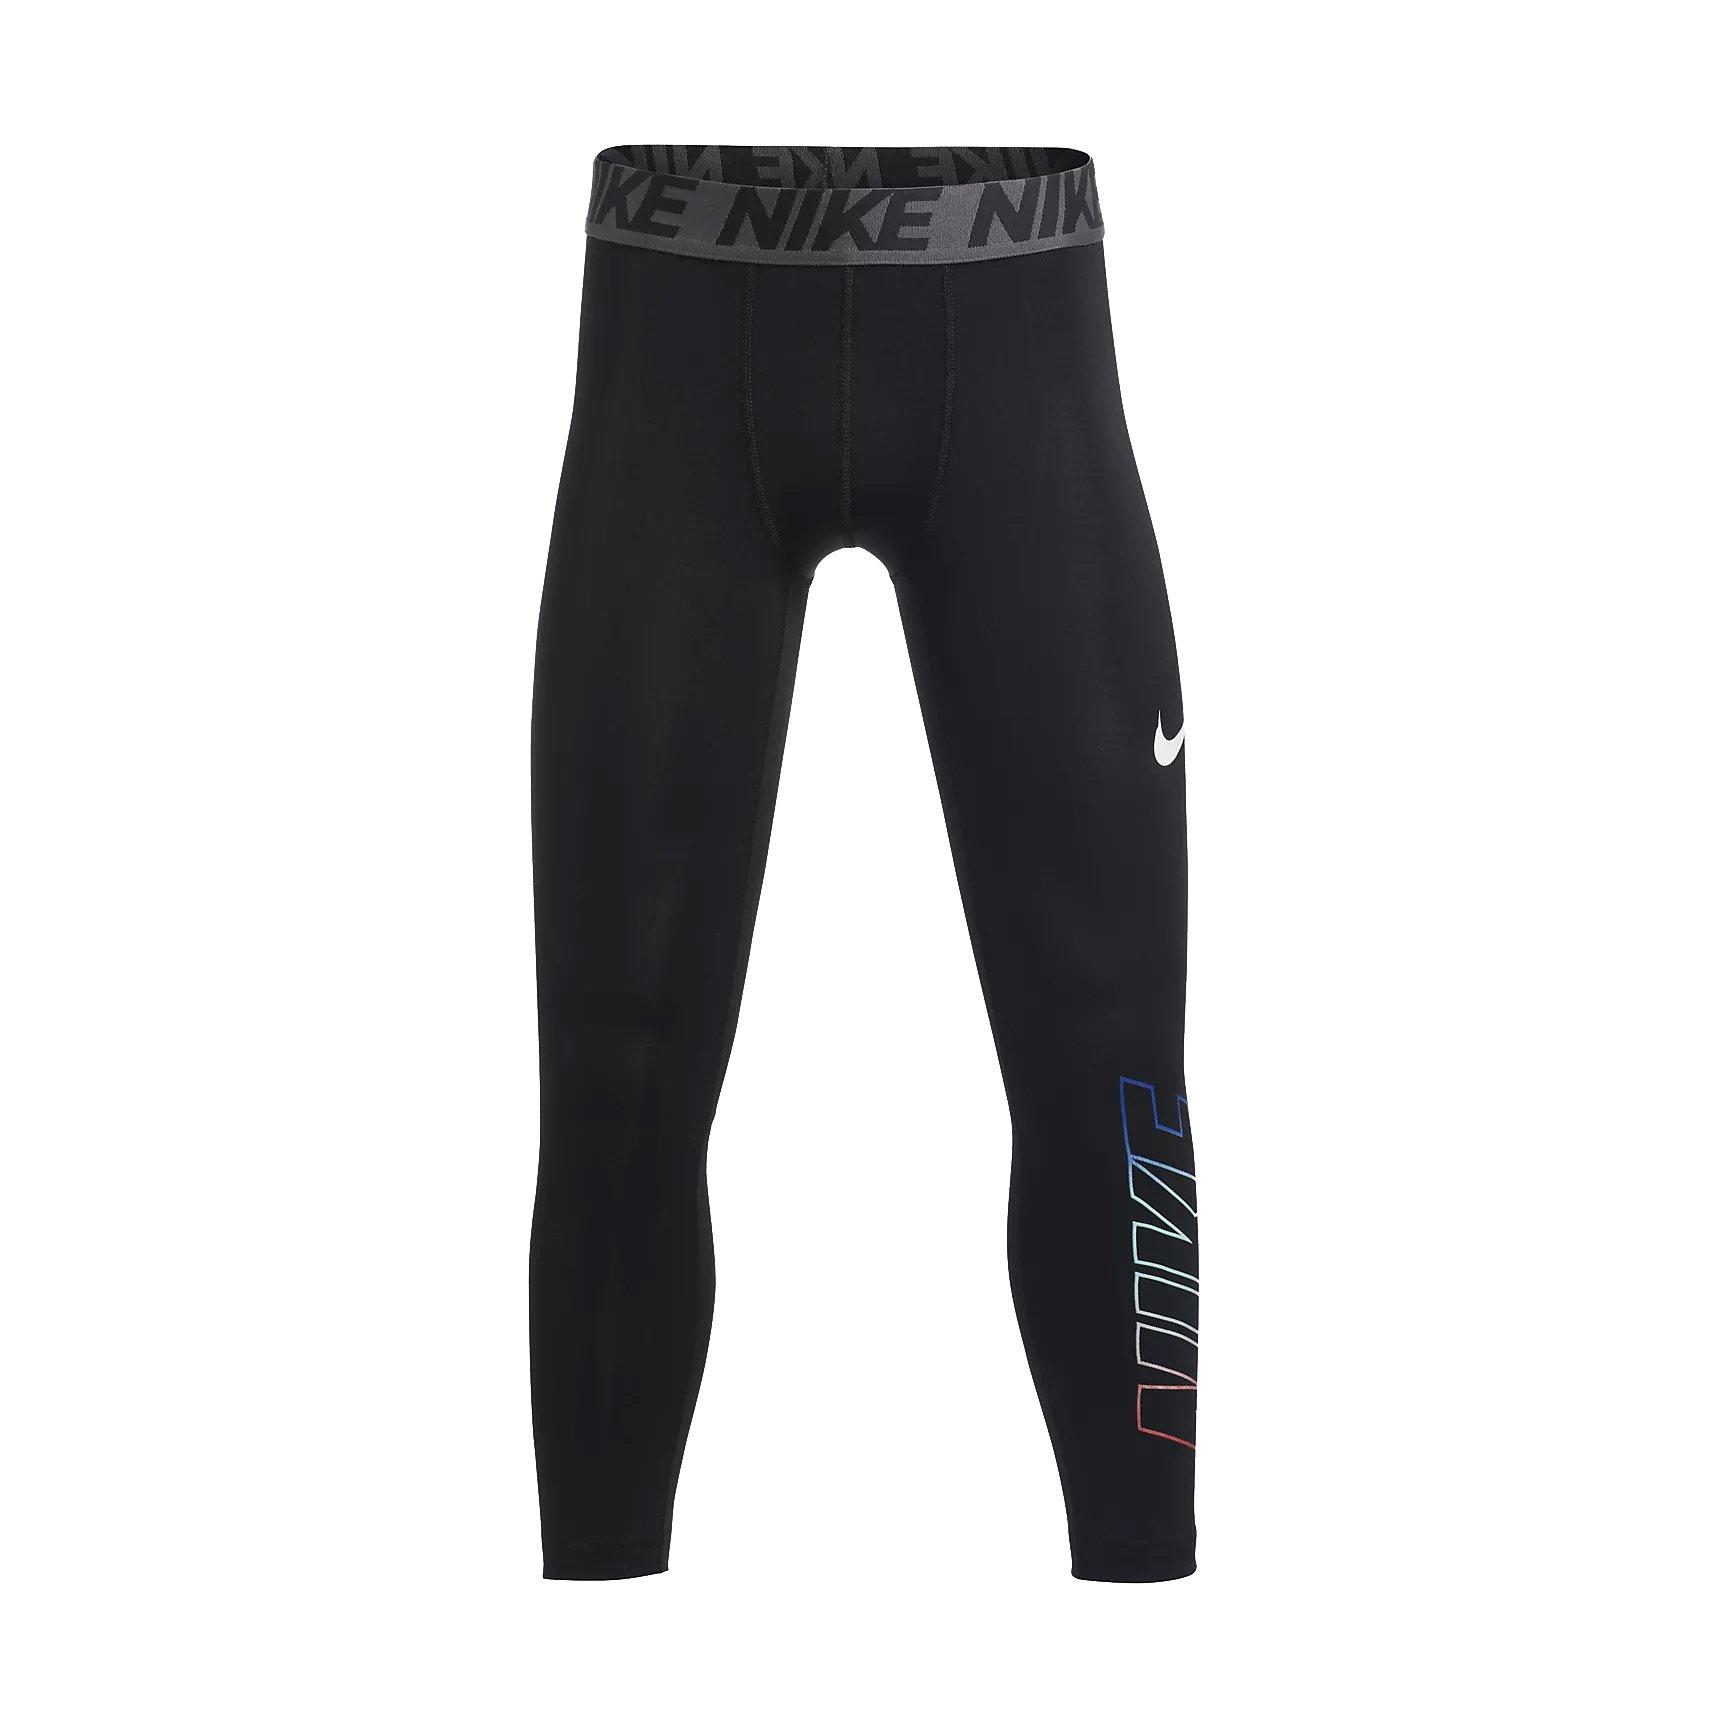 Nike Boy`s Base Layer 3/4 Training Tights (Black (856121-010)/Anthracite/Black, Large) by NIKE